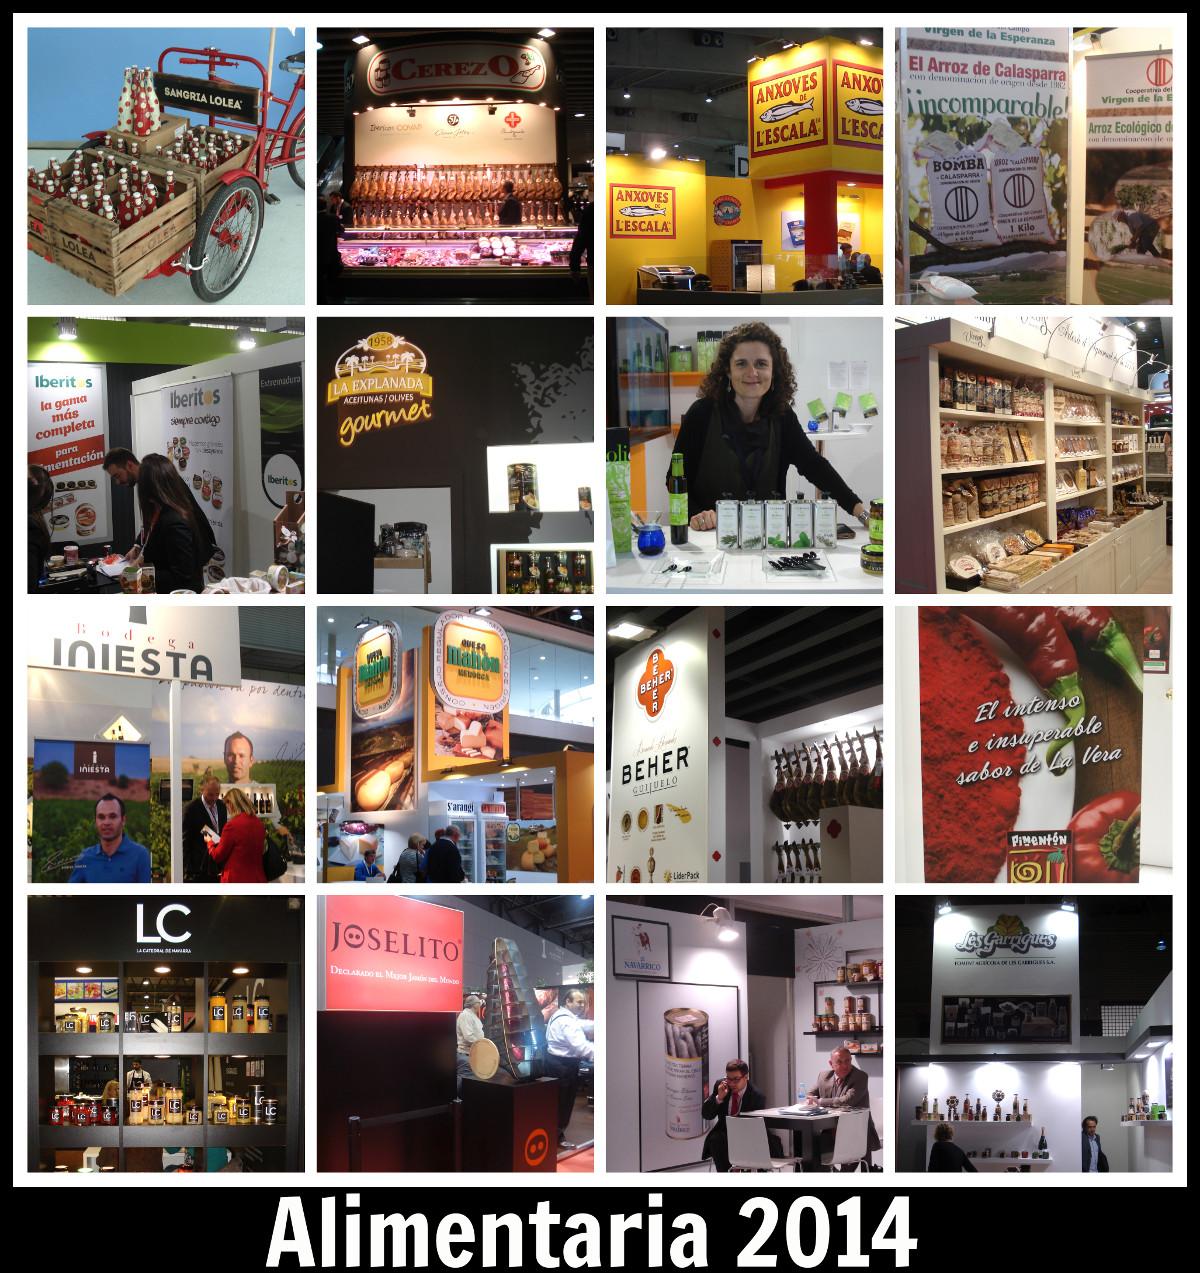 Proveedores de IberGour en Alimentaria 2014